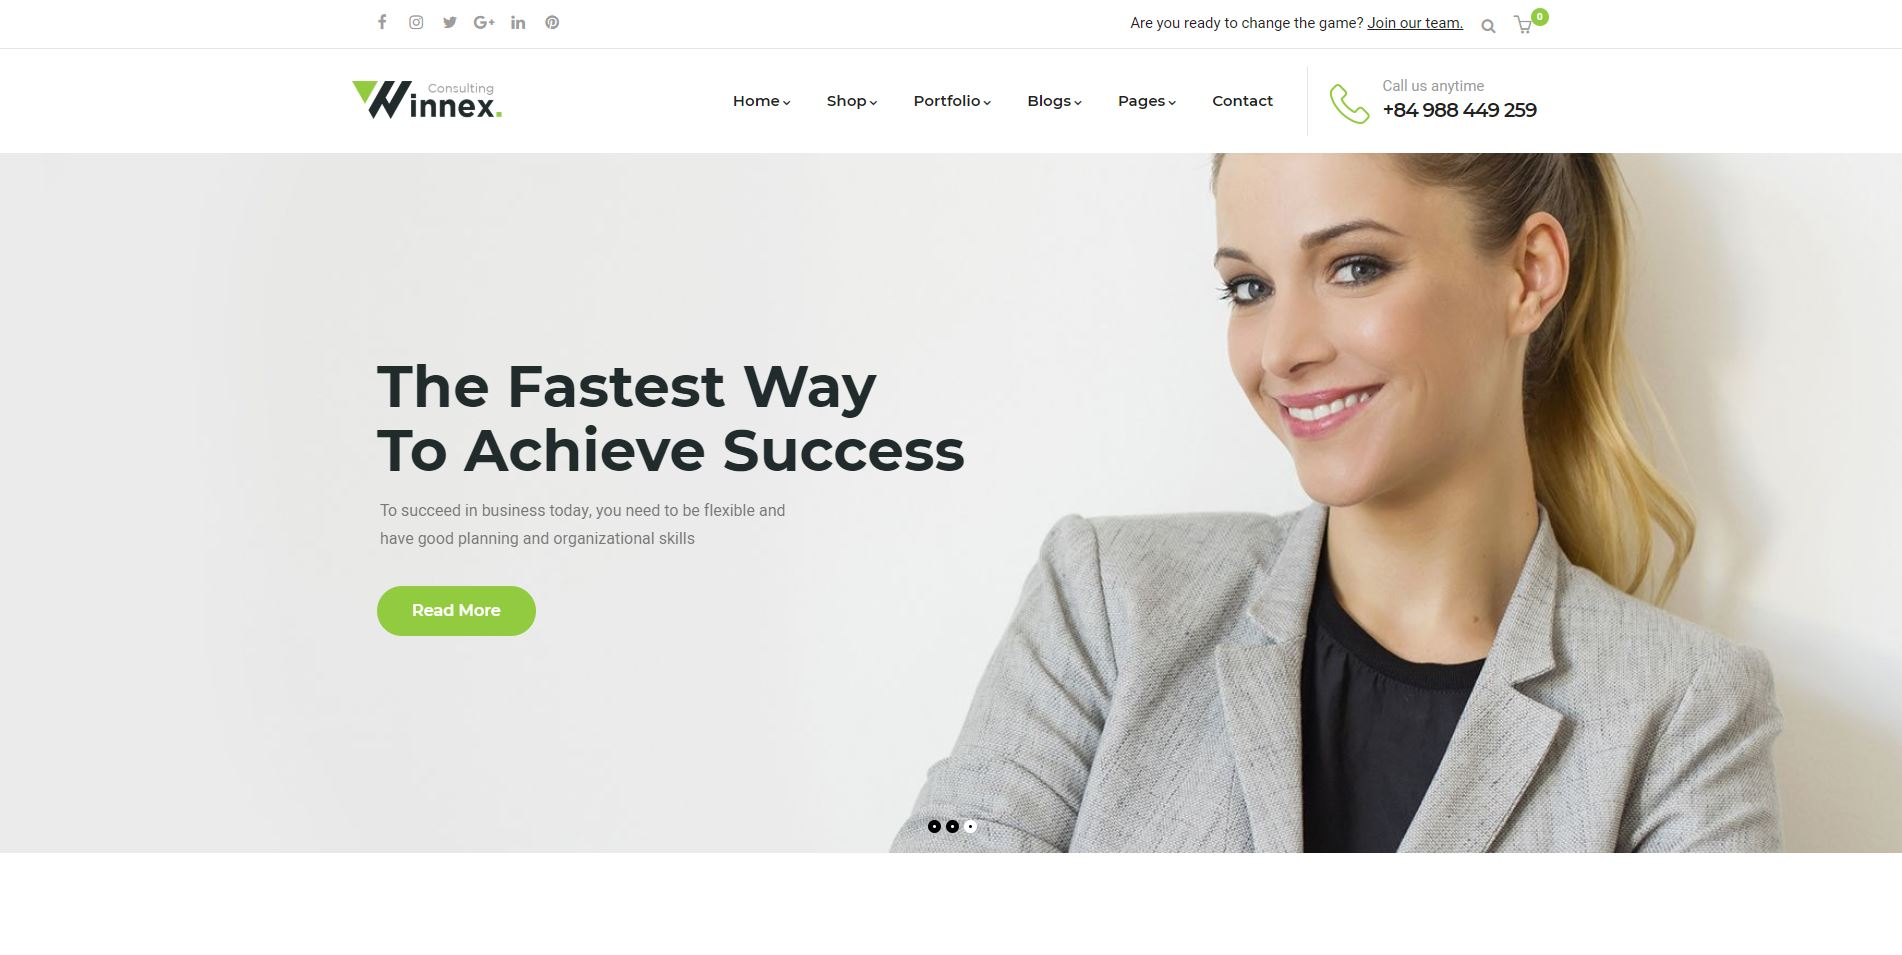 The Best Financial Advisor Websites For 2019 - HarrisMediaGains